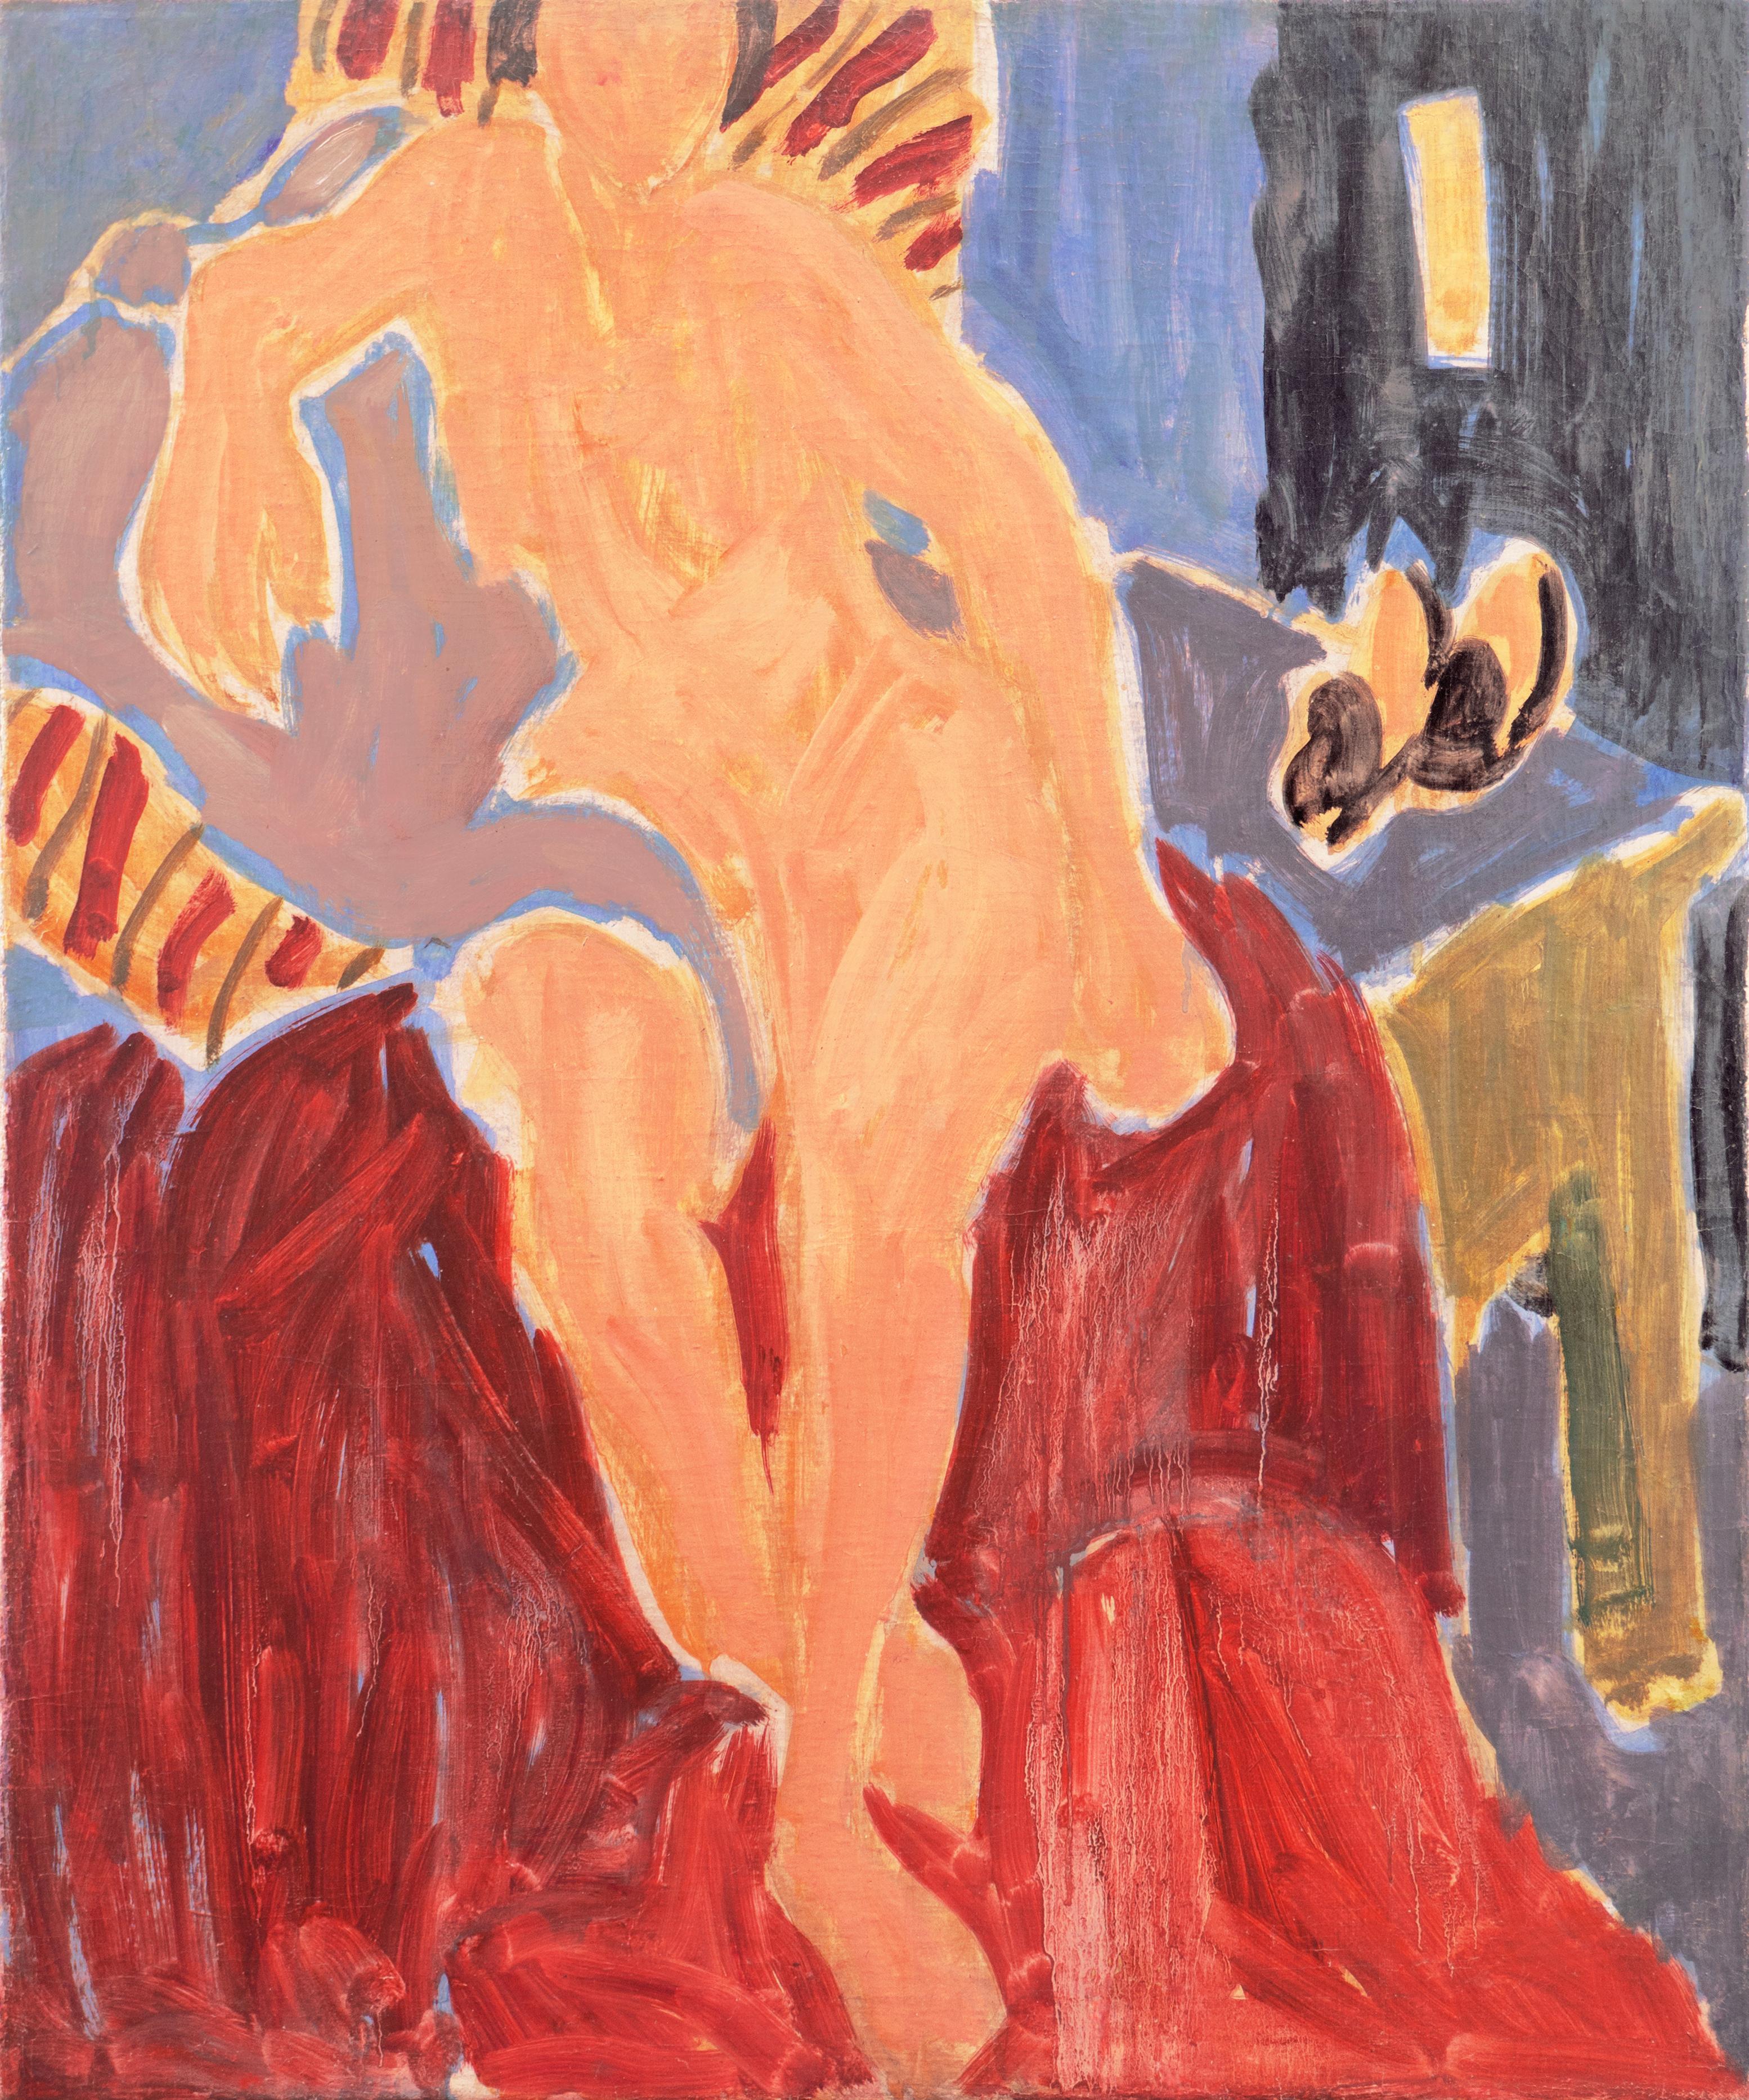 'Seated Nude', Paris, Louvre, Academie Chaumiere, Carmel, California, LACMA, Oil